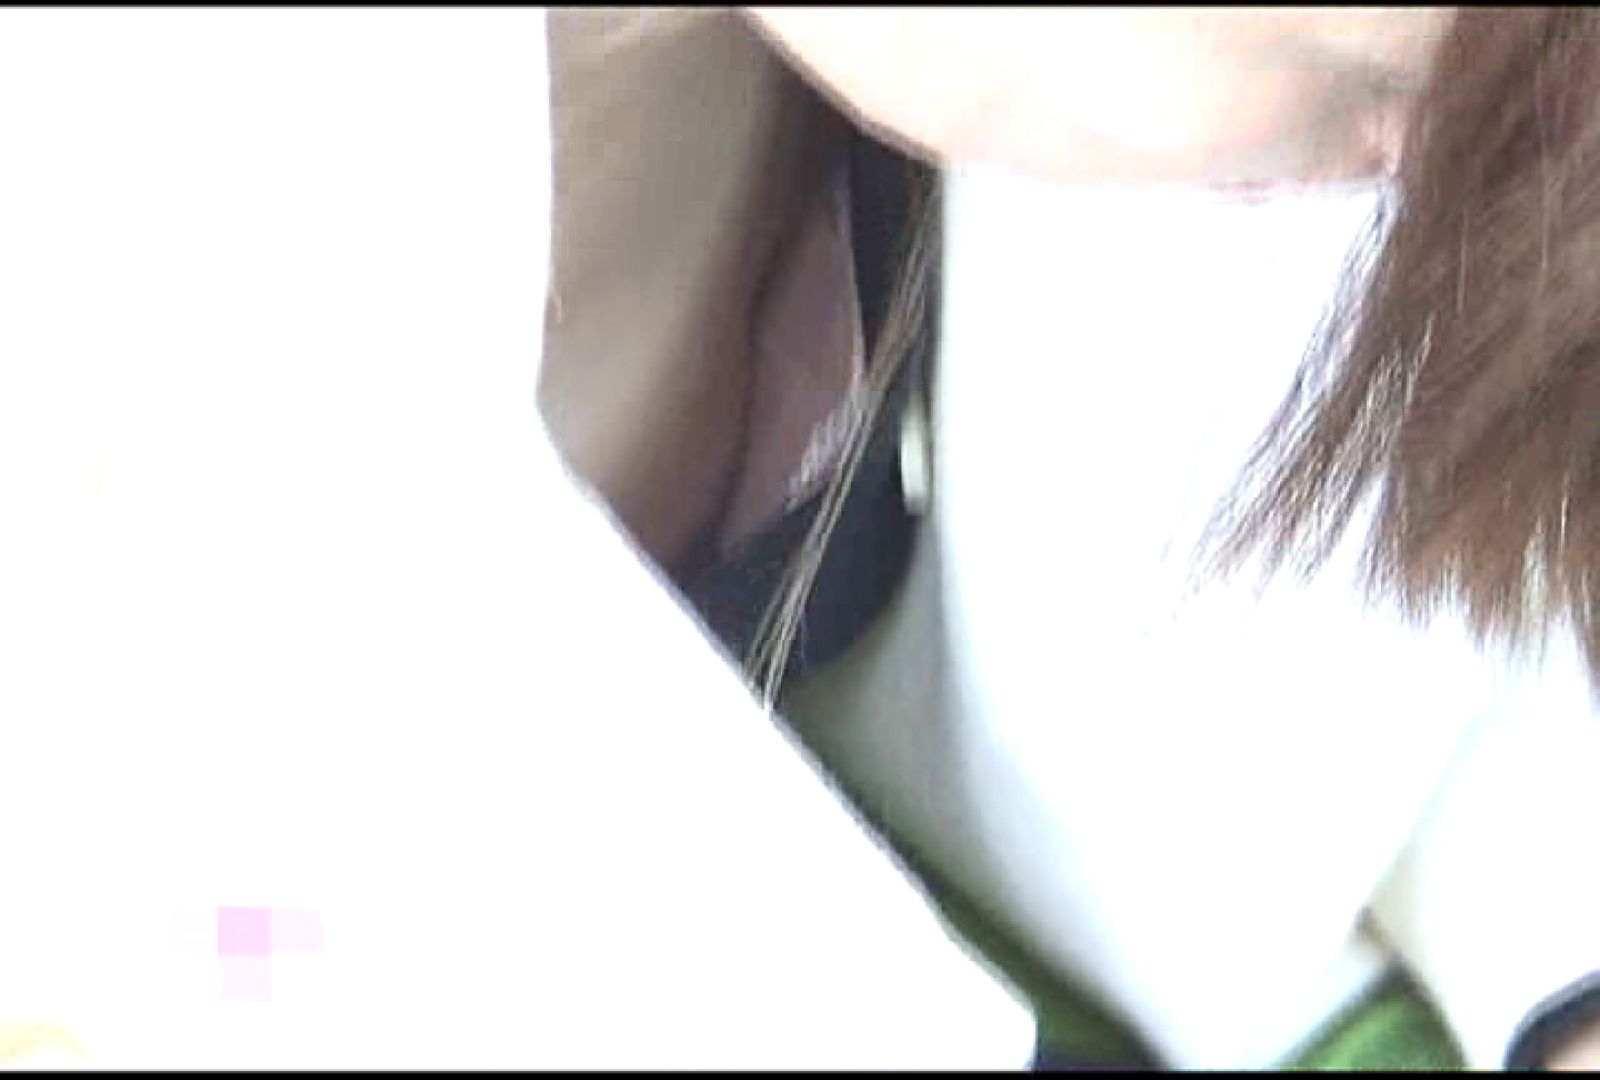 熱視線Vol.5 OLの実態 | 乳首  49pic 1